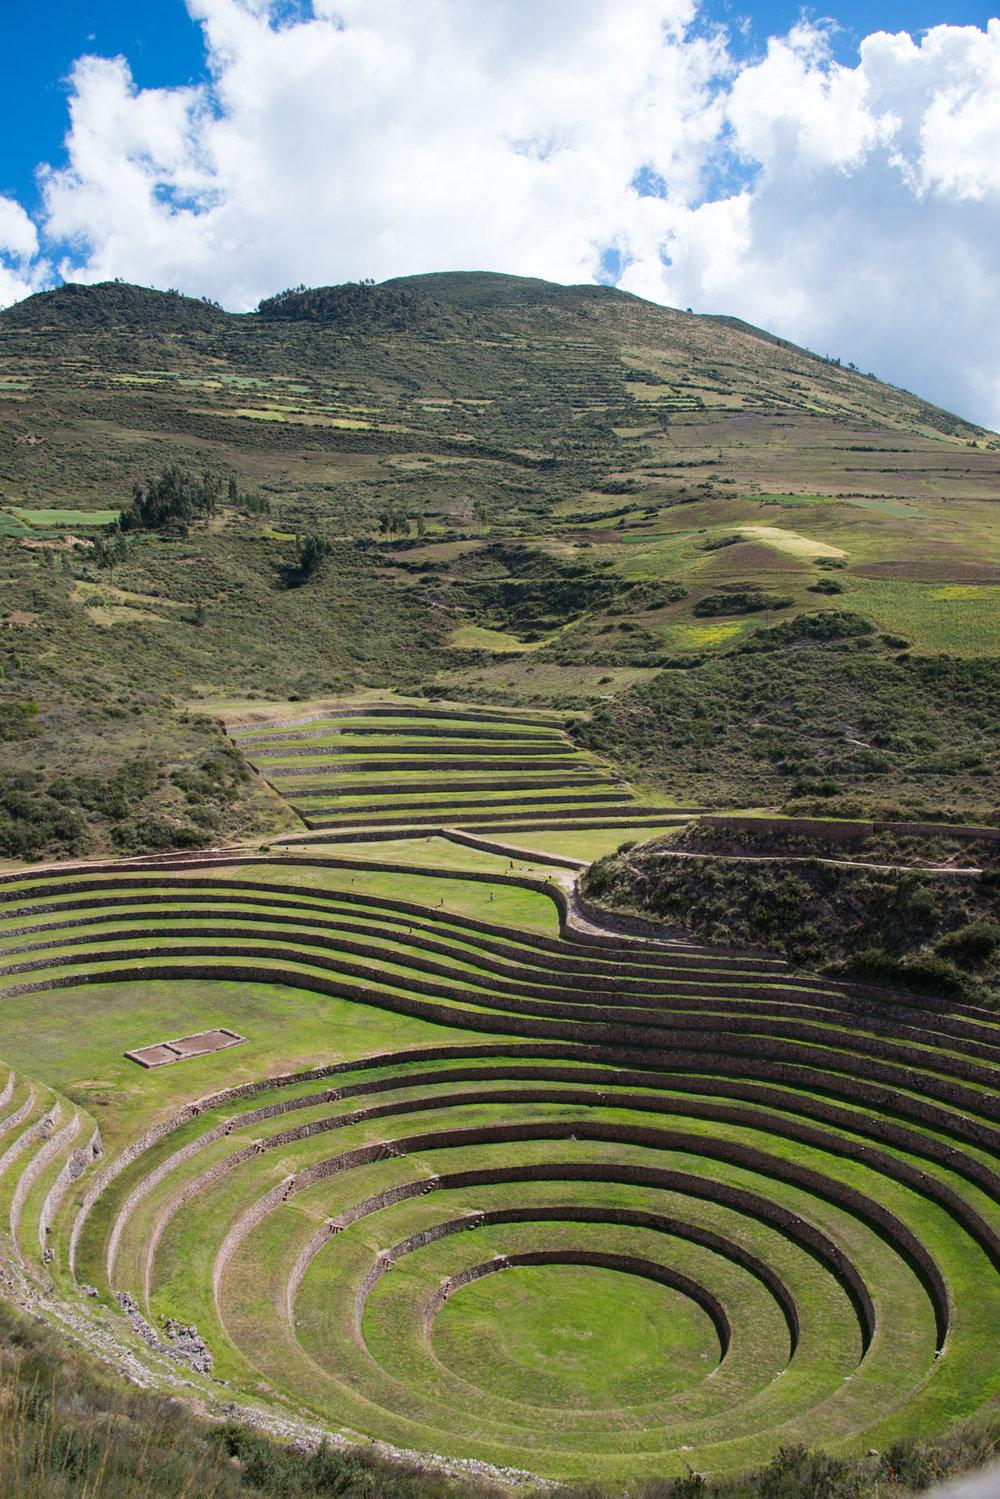 109-Peru-5-15.jpg